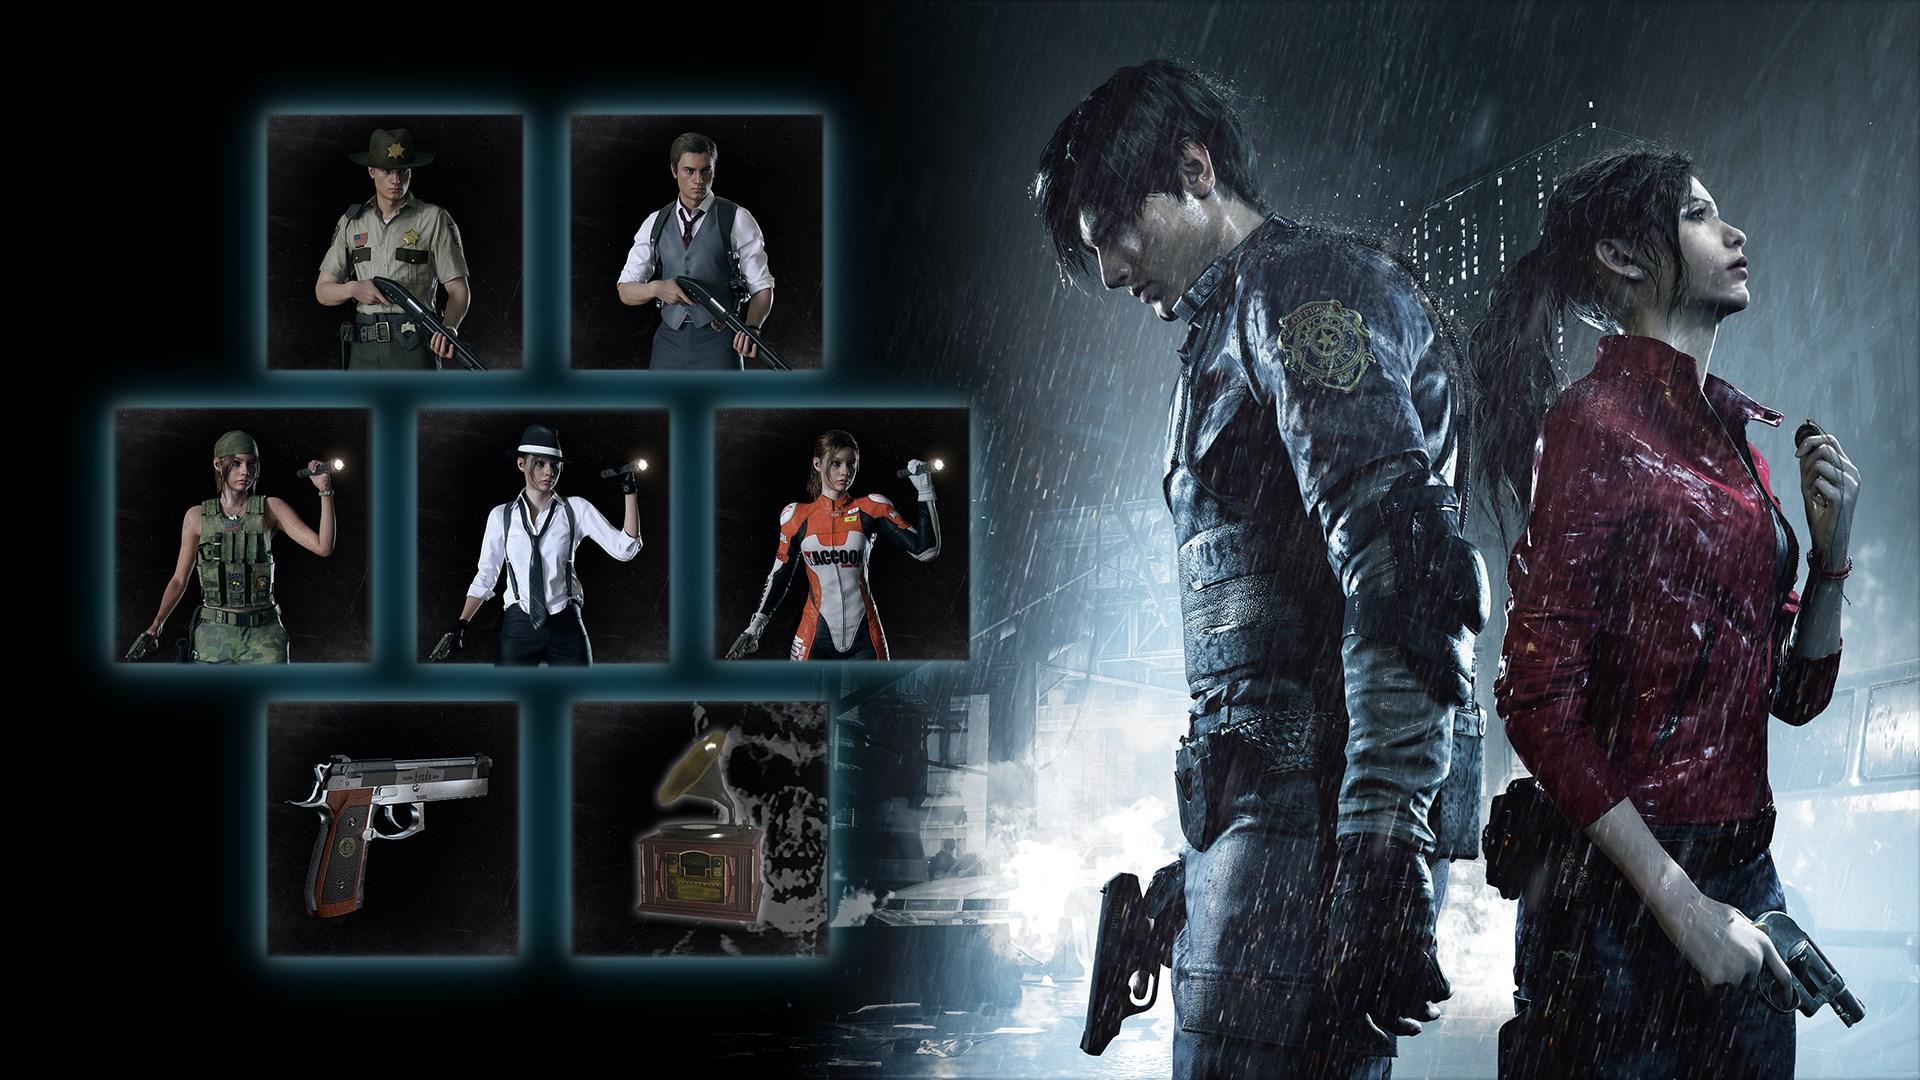 Buy Resident Evil 2 Extra DLC Pack - Microsoft Store